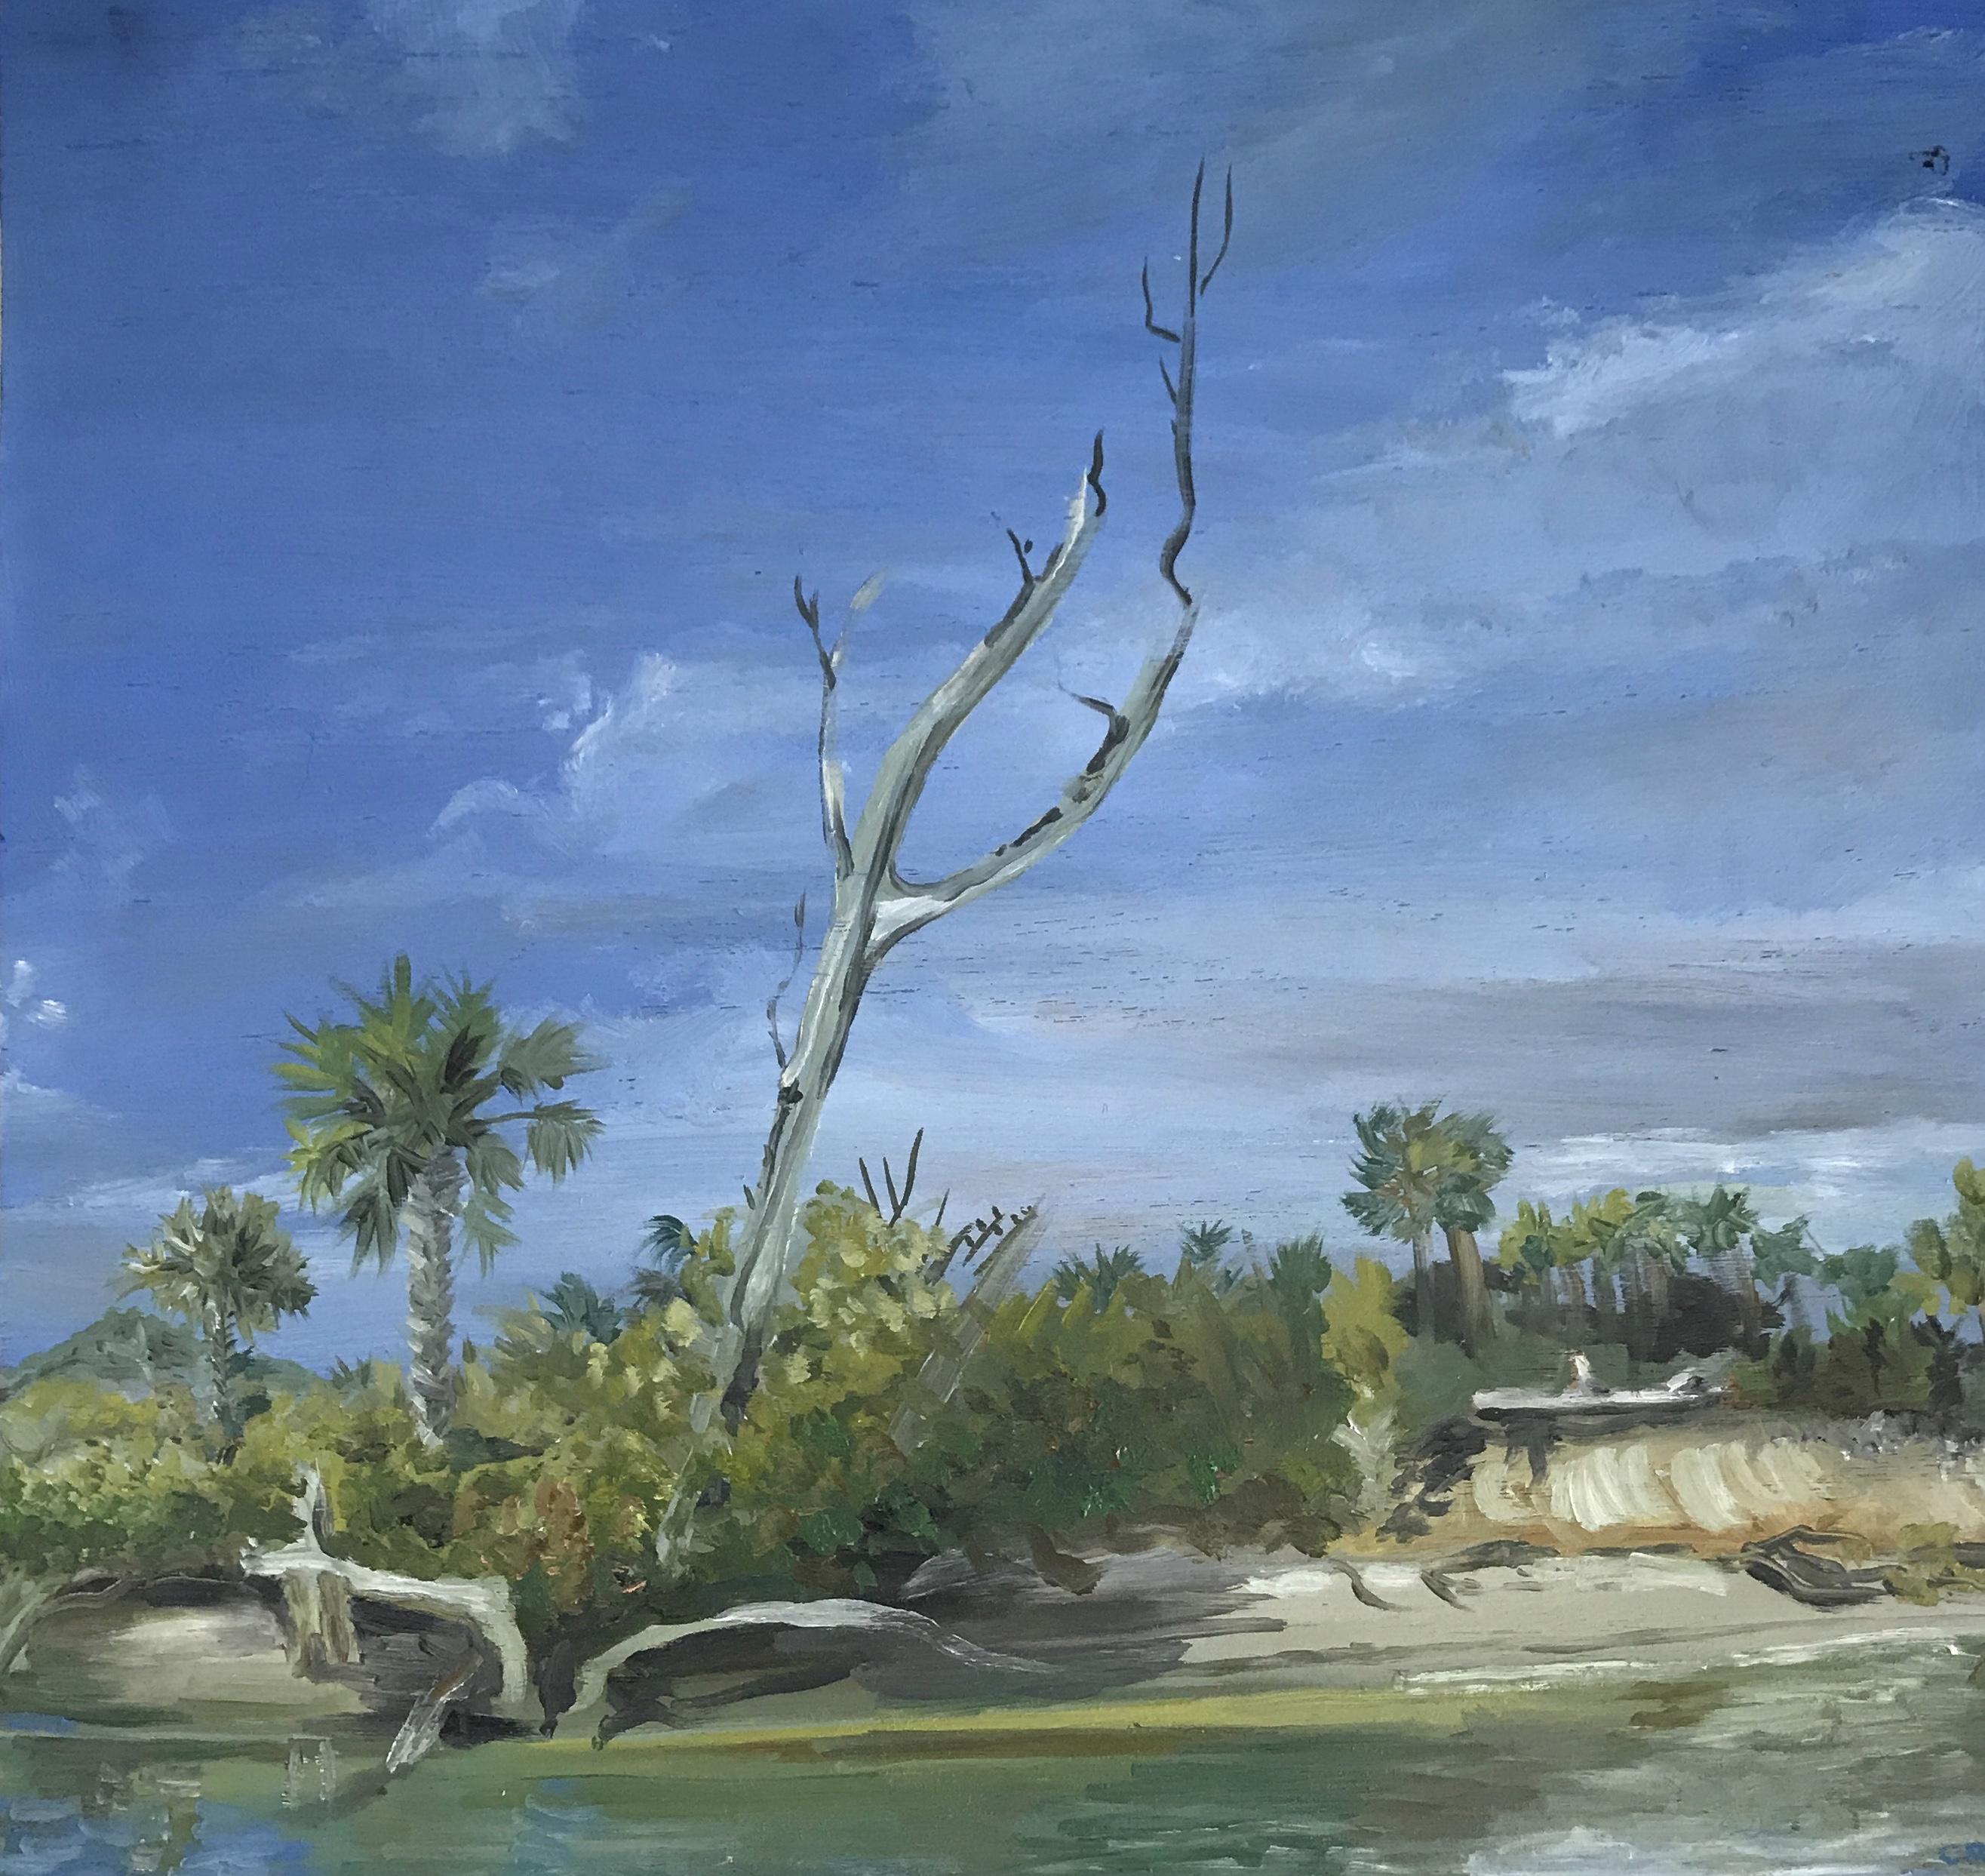 Jupiter Lighthouse Island